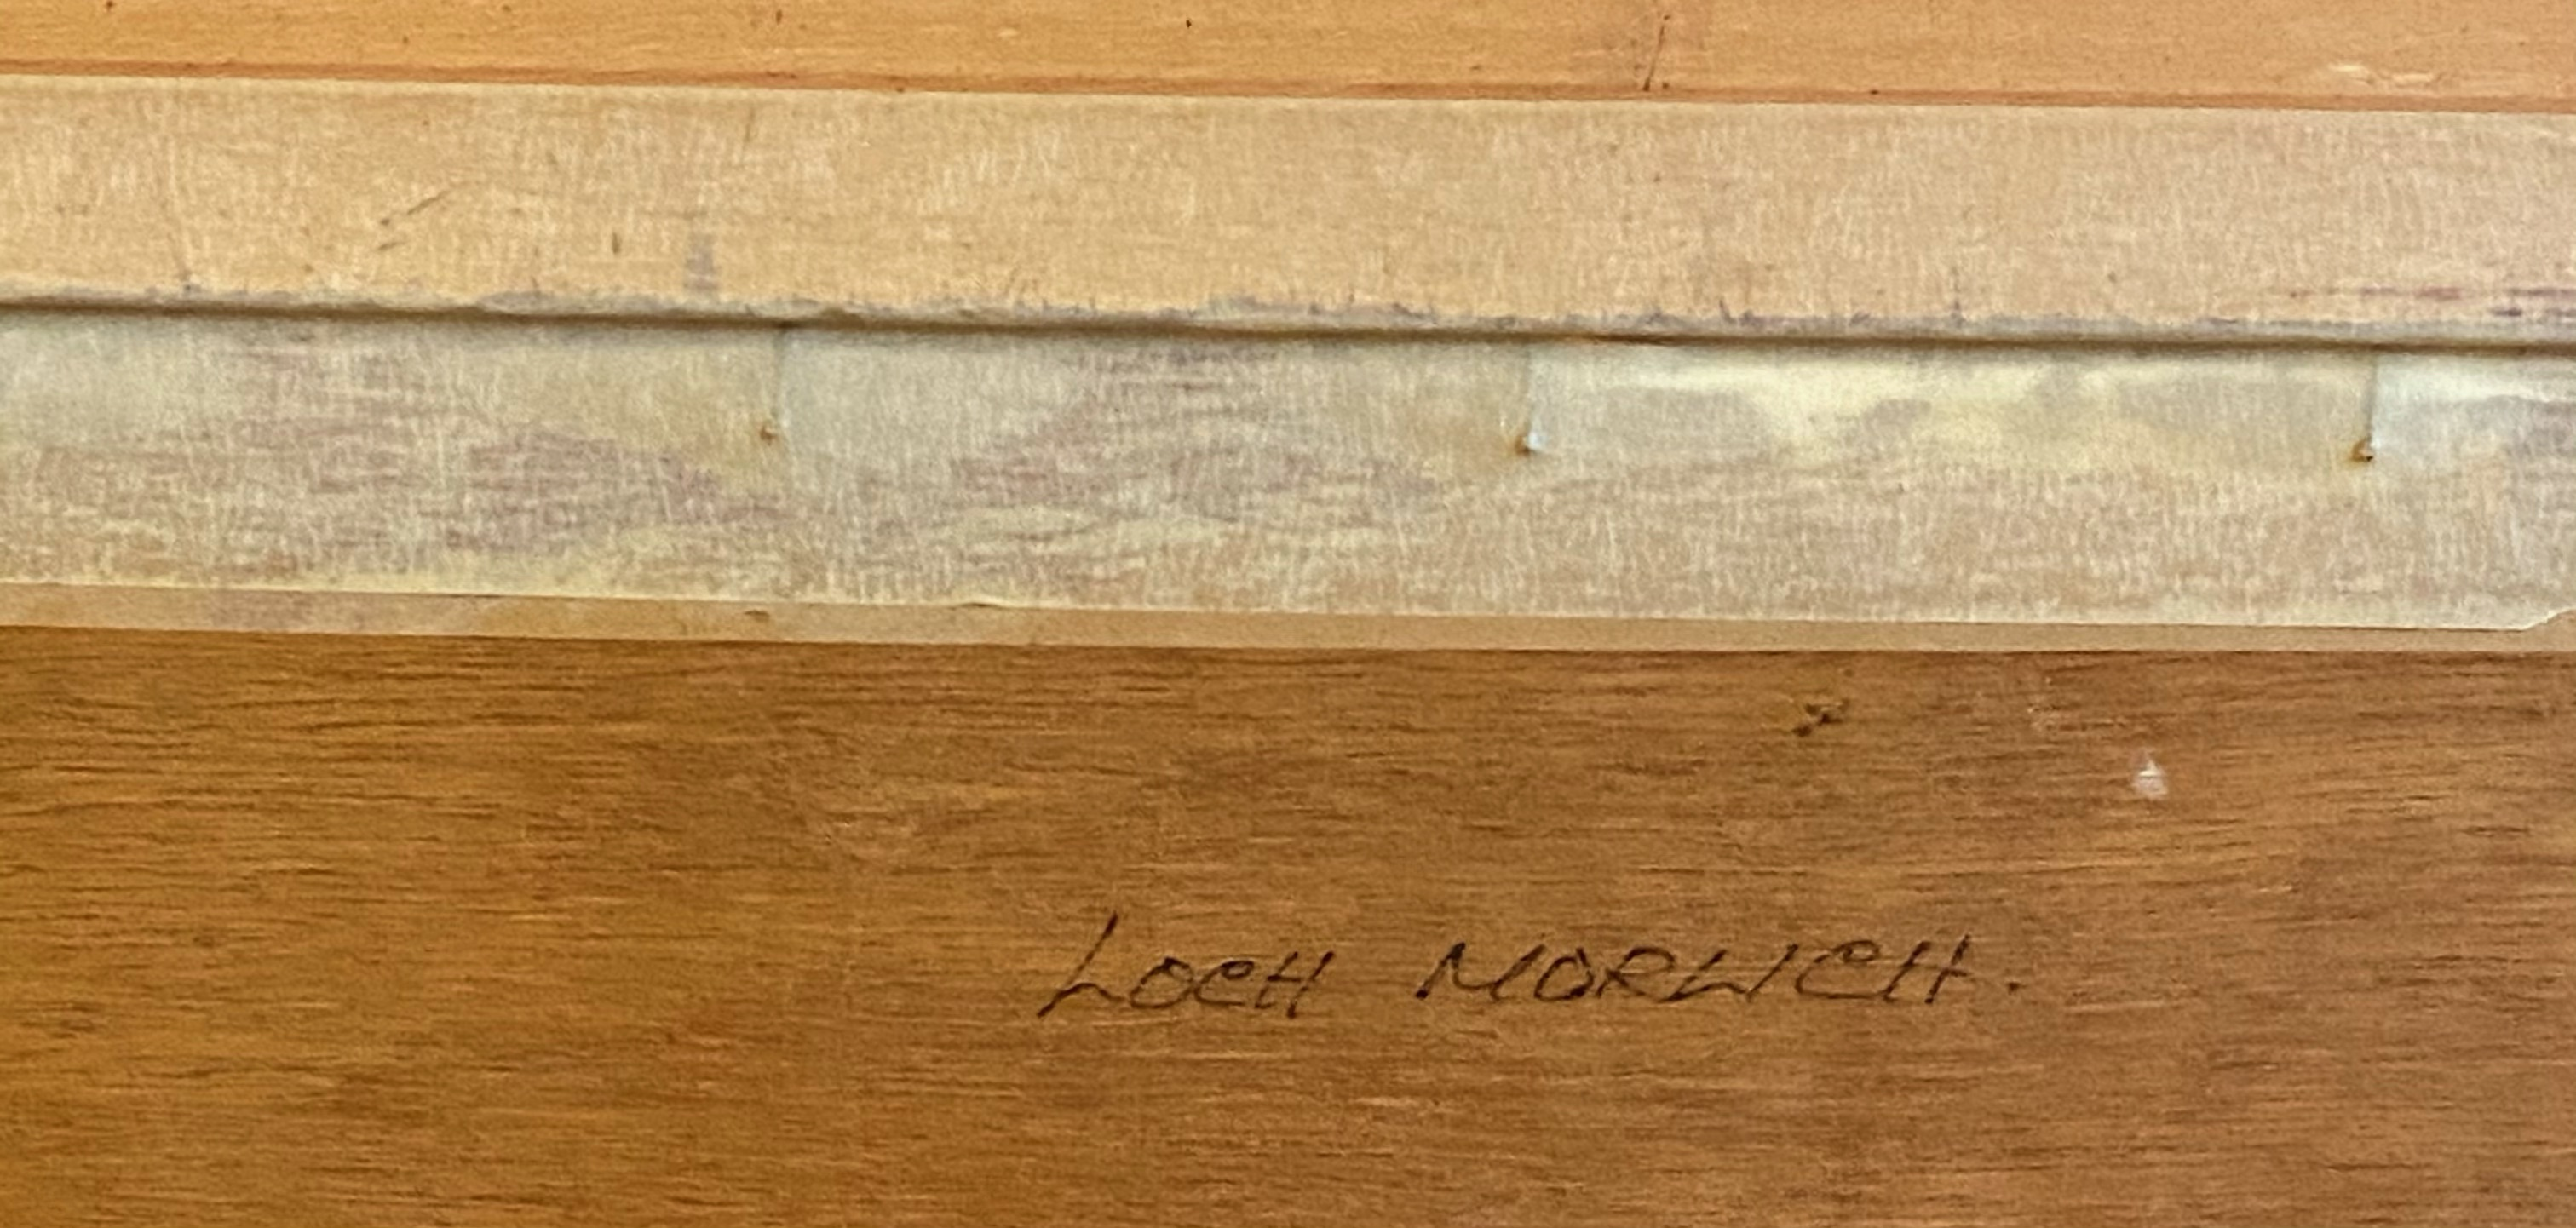 "Donald M Shearer (Scottish) Original signed oil Scottish View ""Loch Morlich"" Donald - Image 3 of 5"